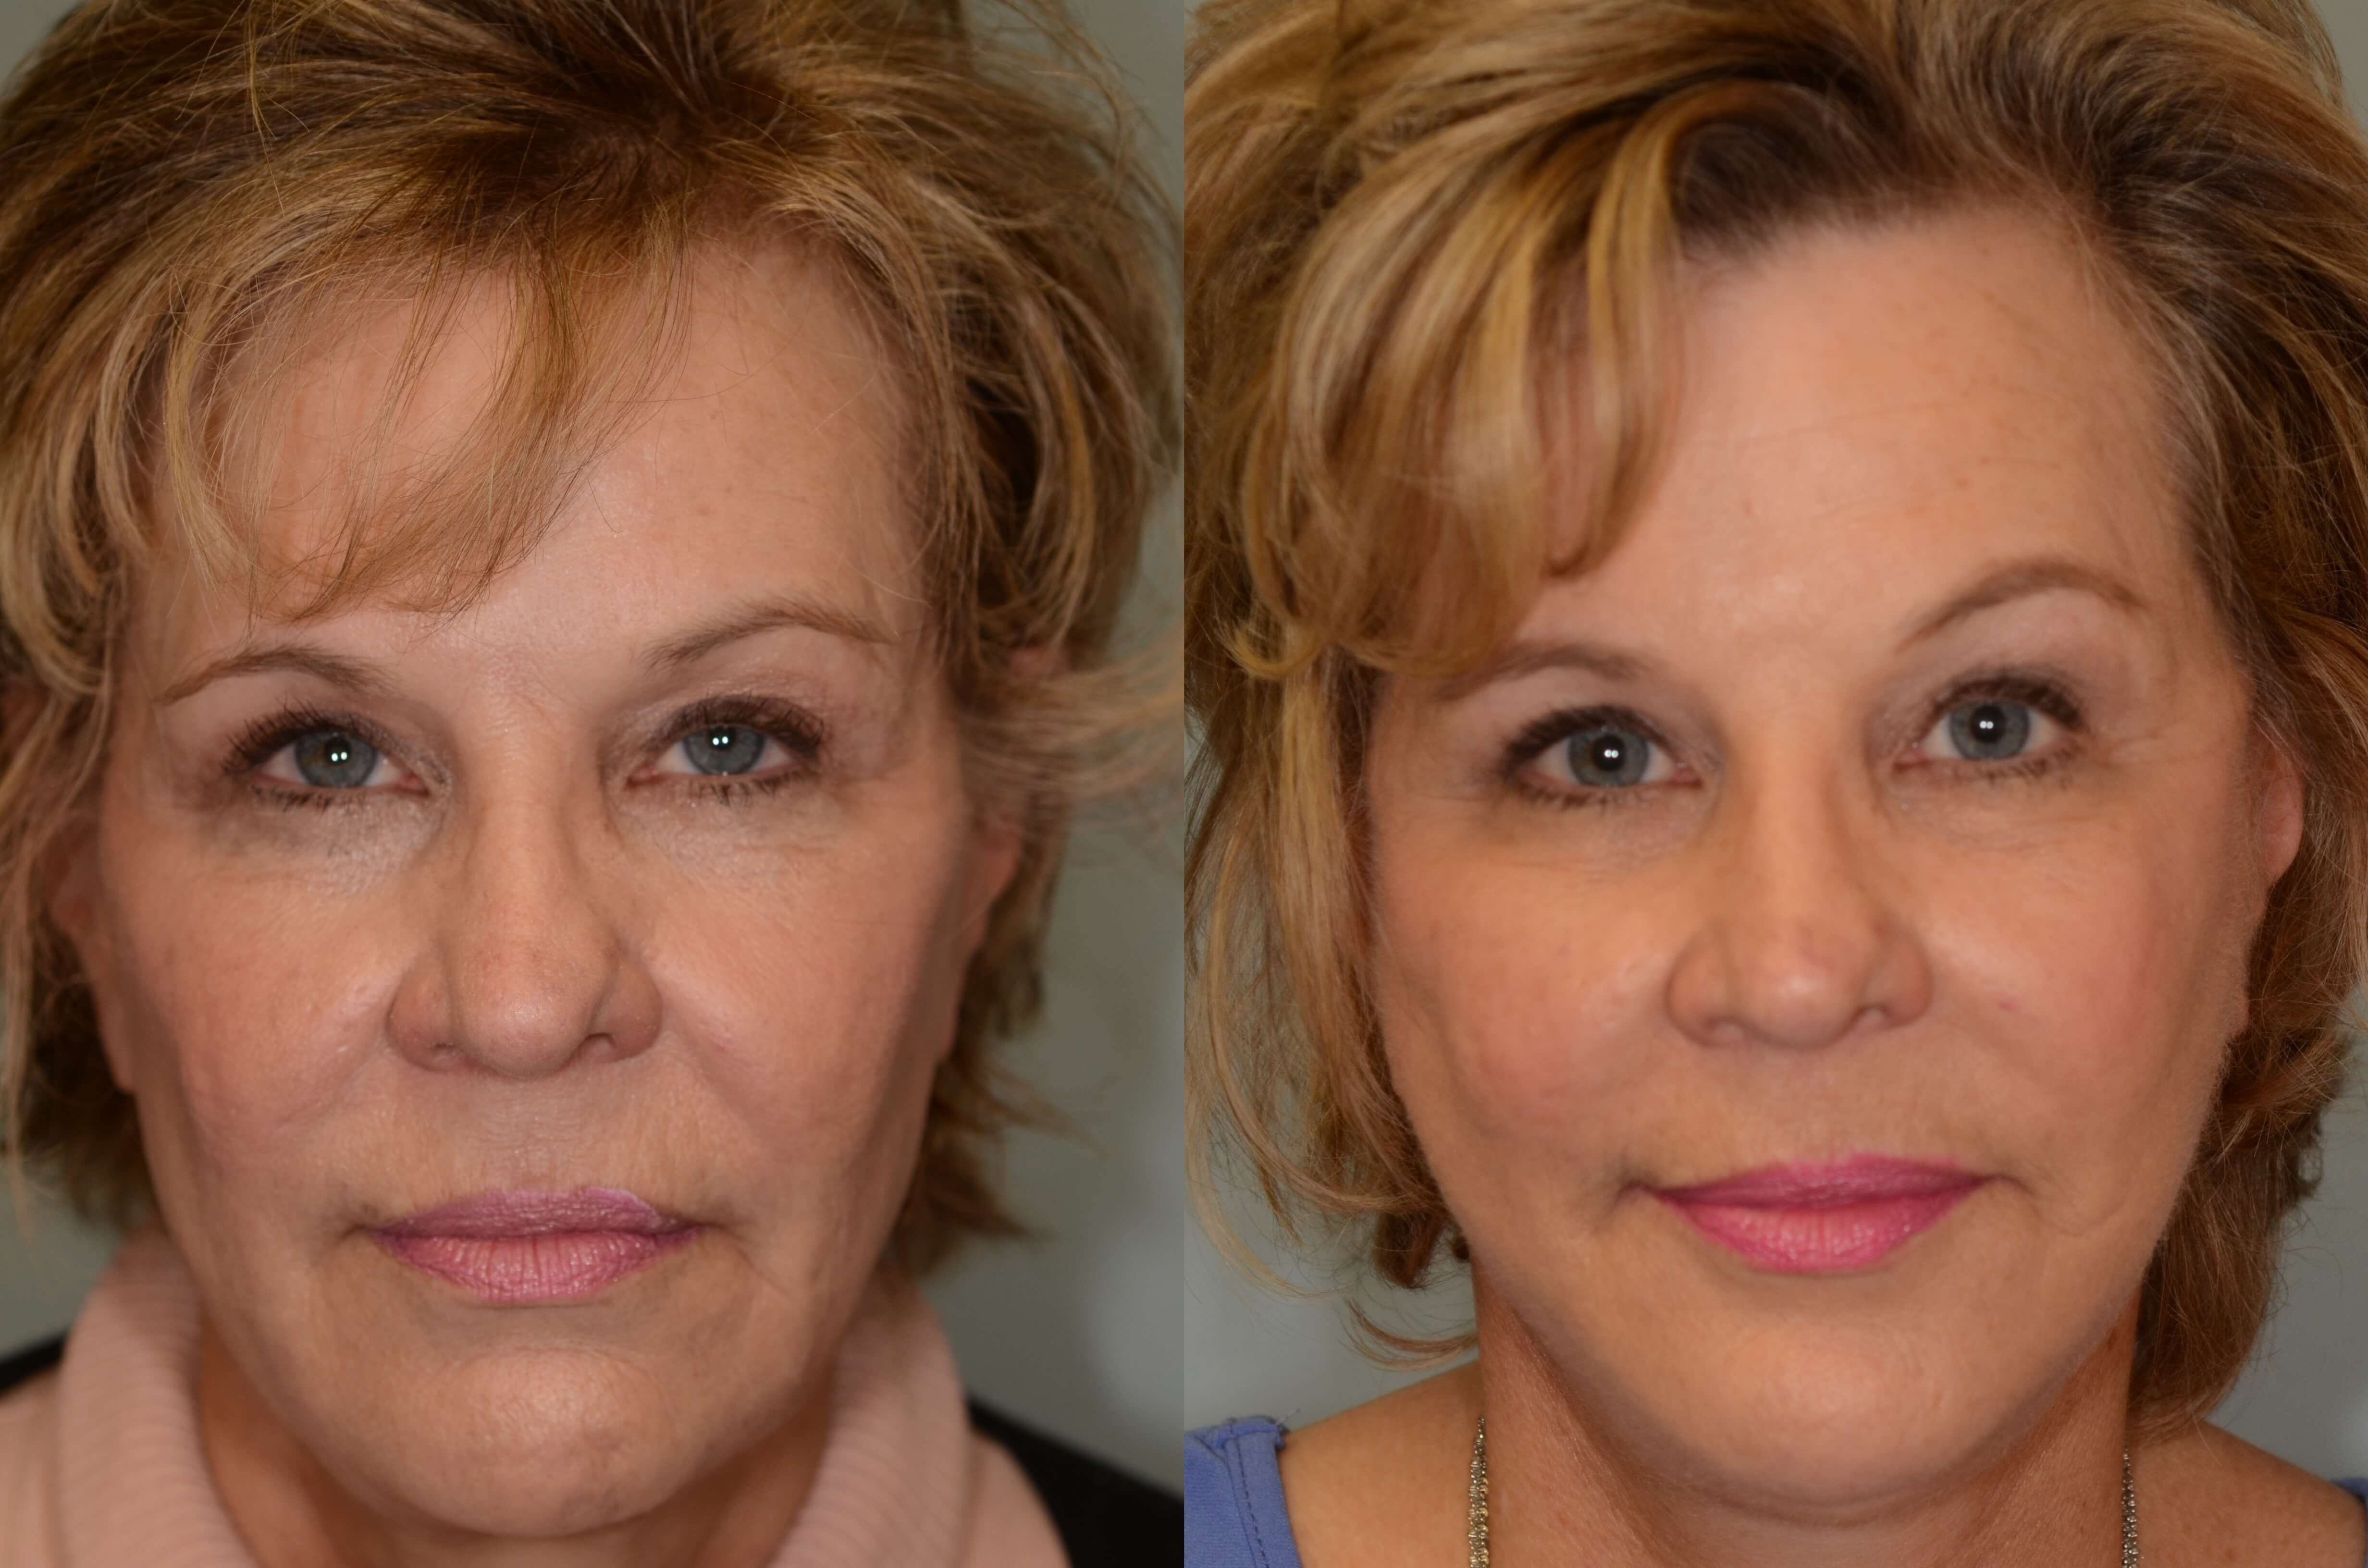 Update On Necklift With Platysmaplasty & Neck Liposuction